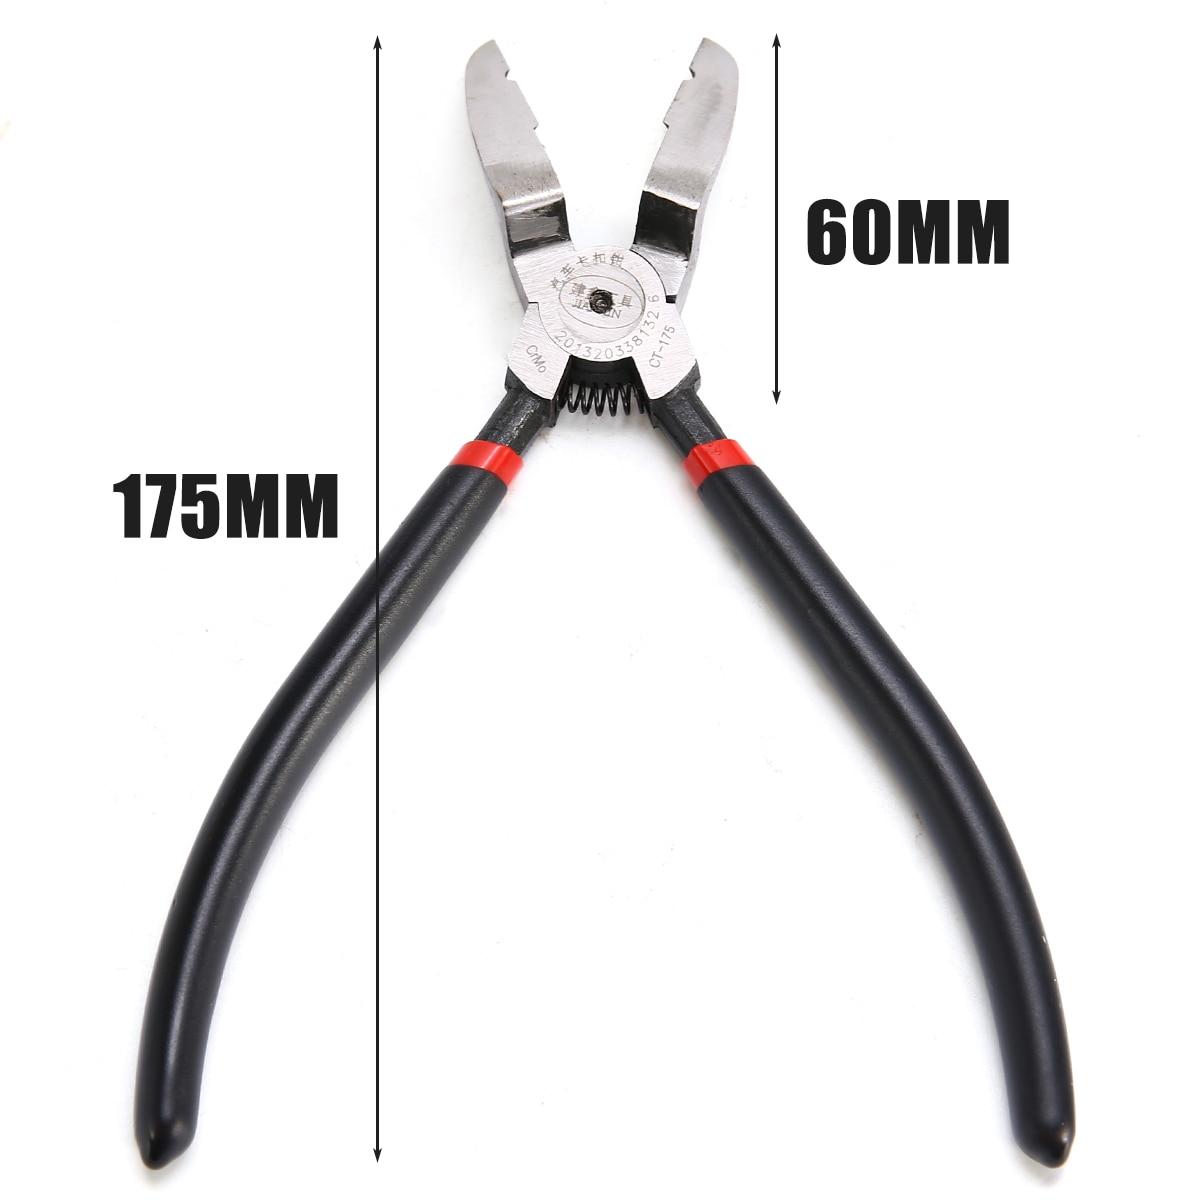 Mayitr 1pc 17.5cm Car Push Retainer Rivet Piler Trim Fastener Clip Panel Puller Plier Remover Tool for Honda Nissan BMW